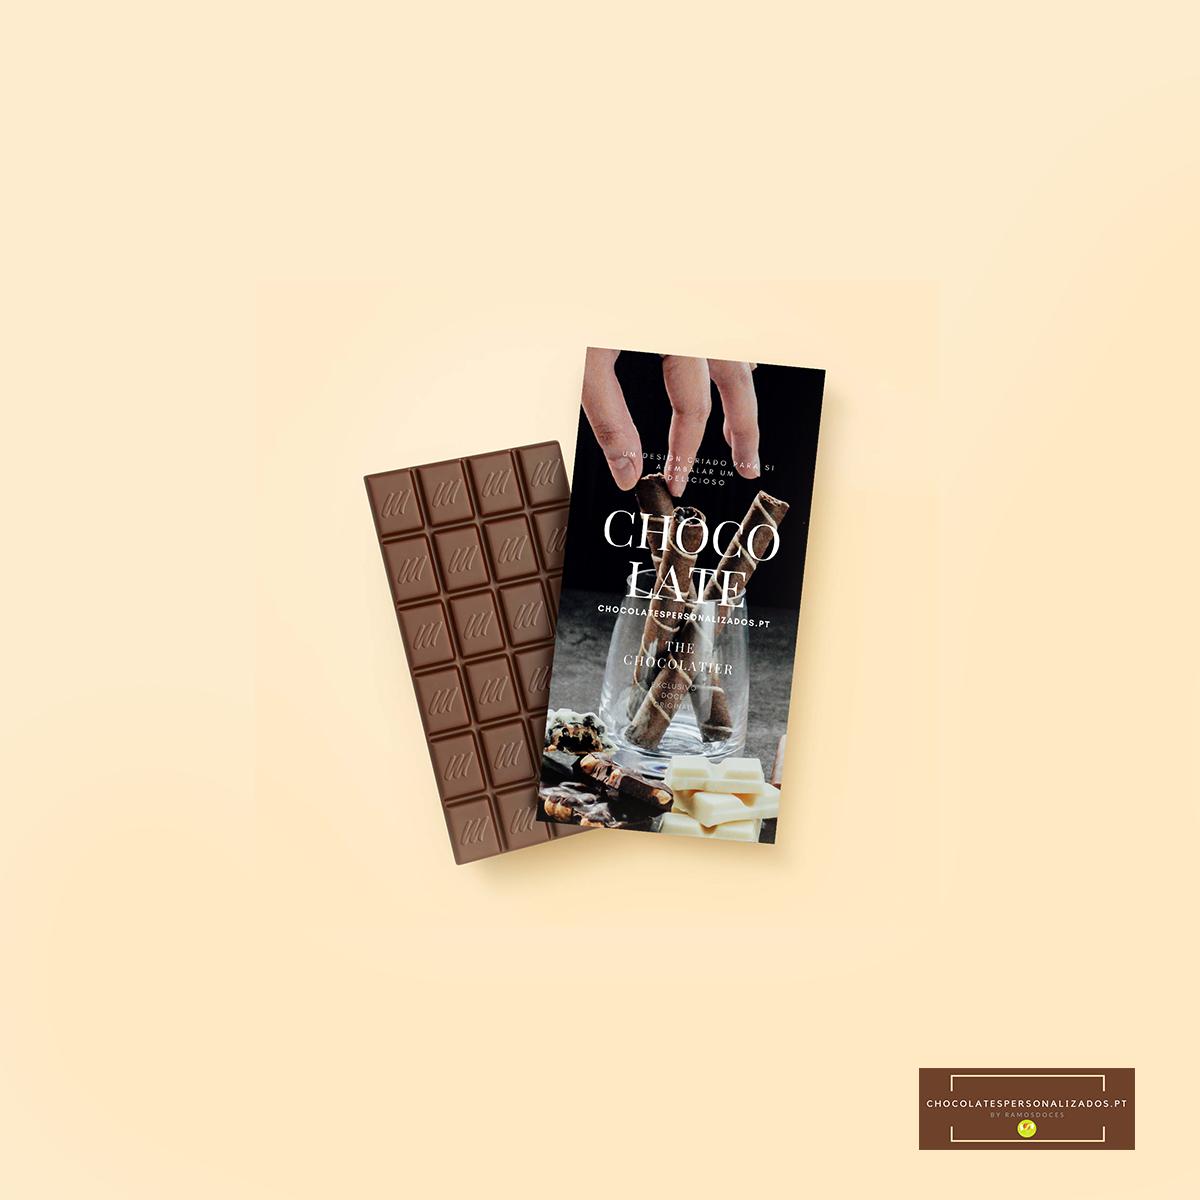 chocolates personalizados para todo o tipo de ocasioes made in portugal